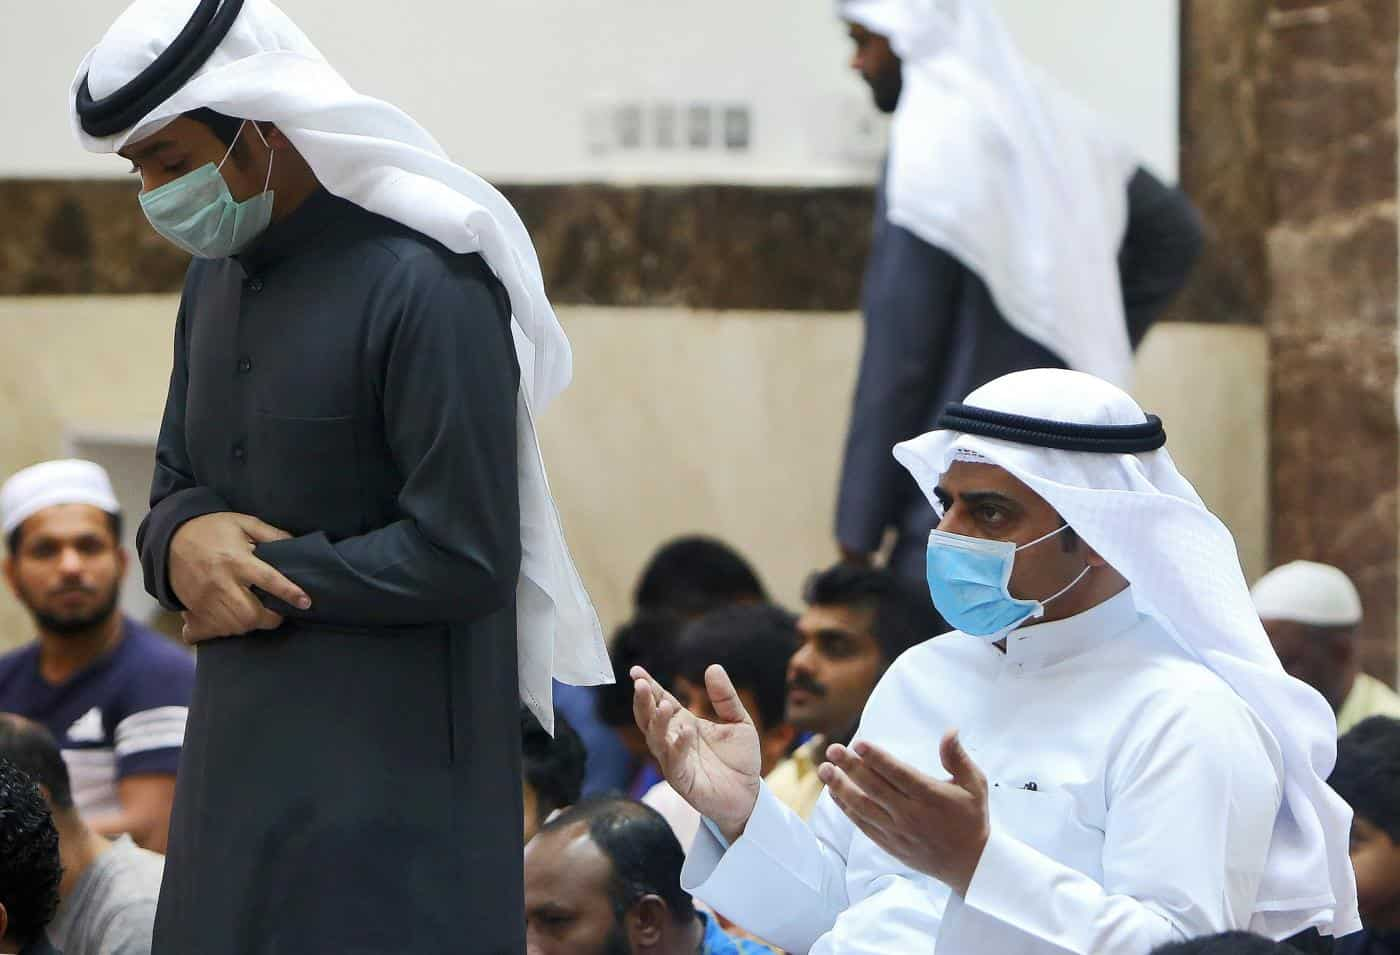 COVID-19 Lockdown Complicates Home Life for Kuwaiti Polygamists